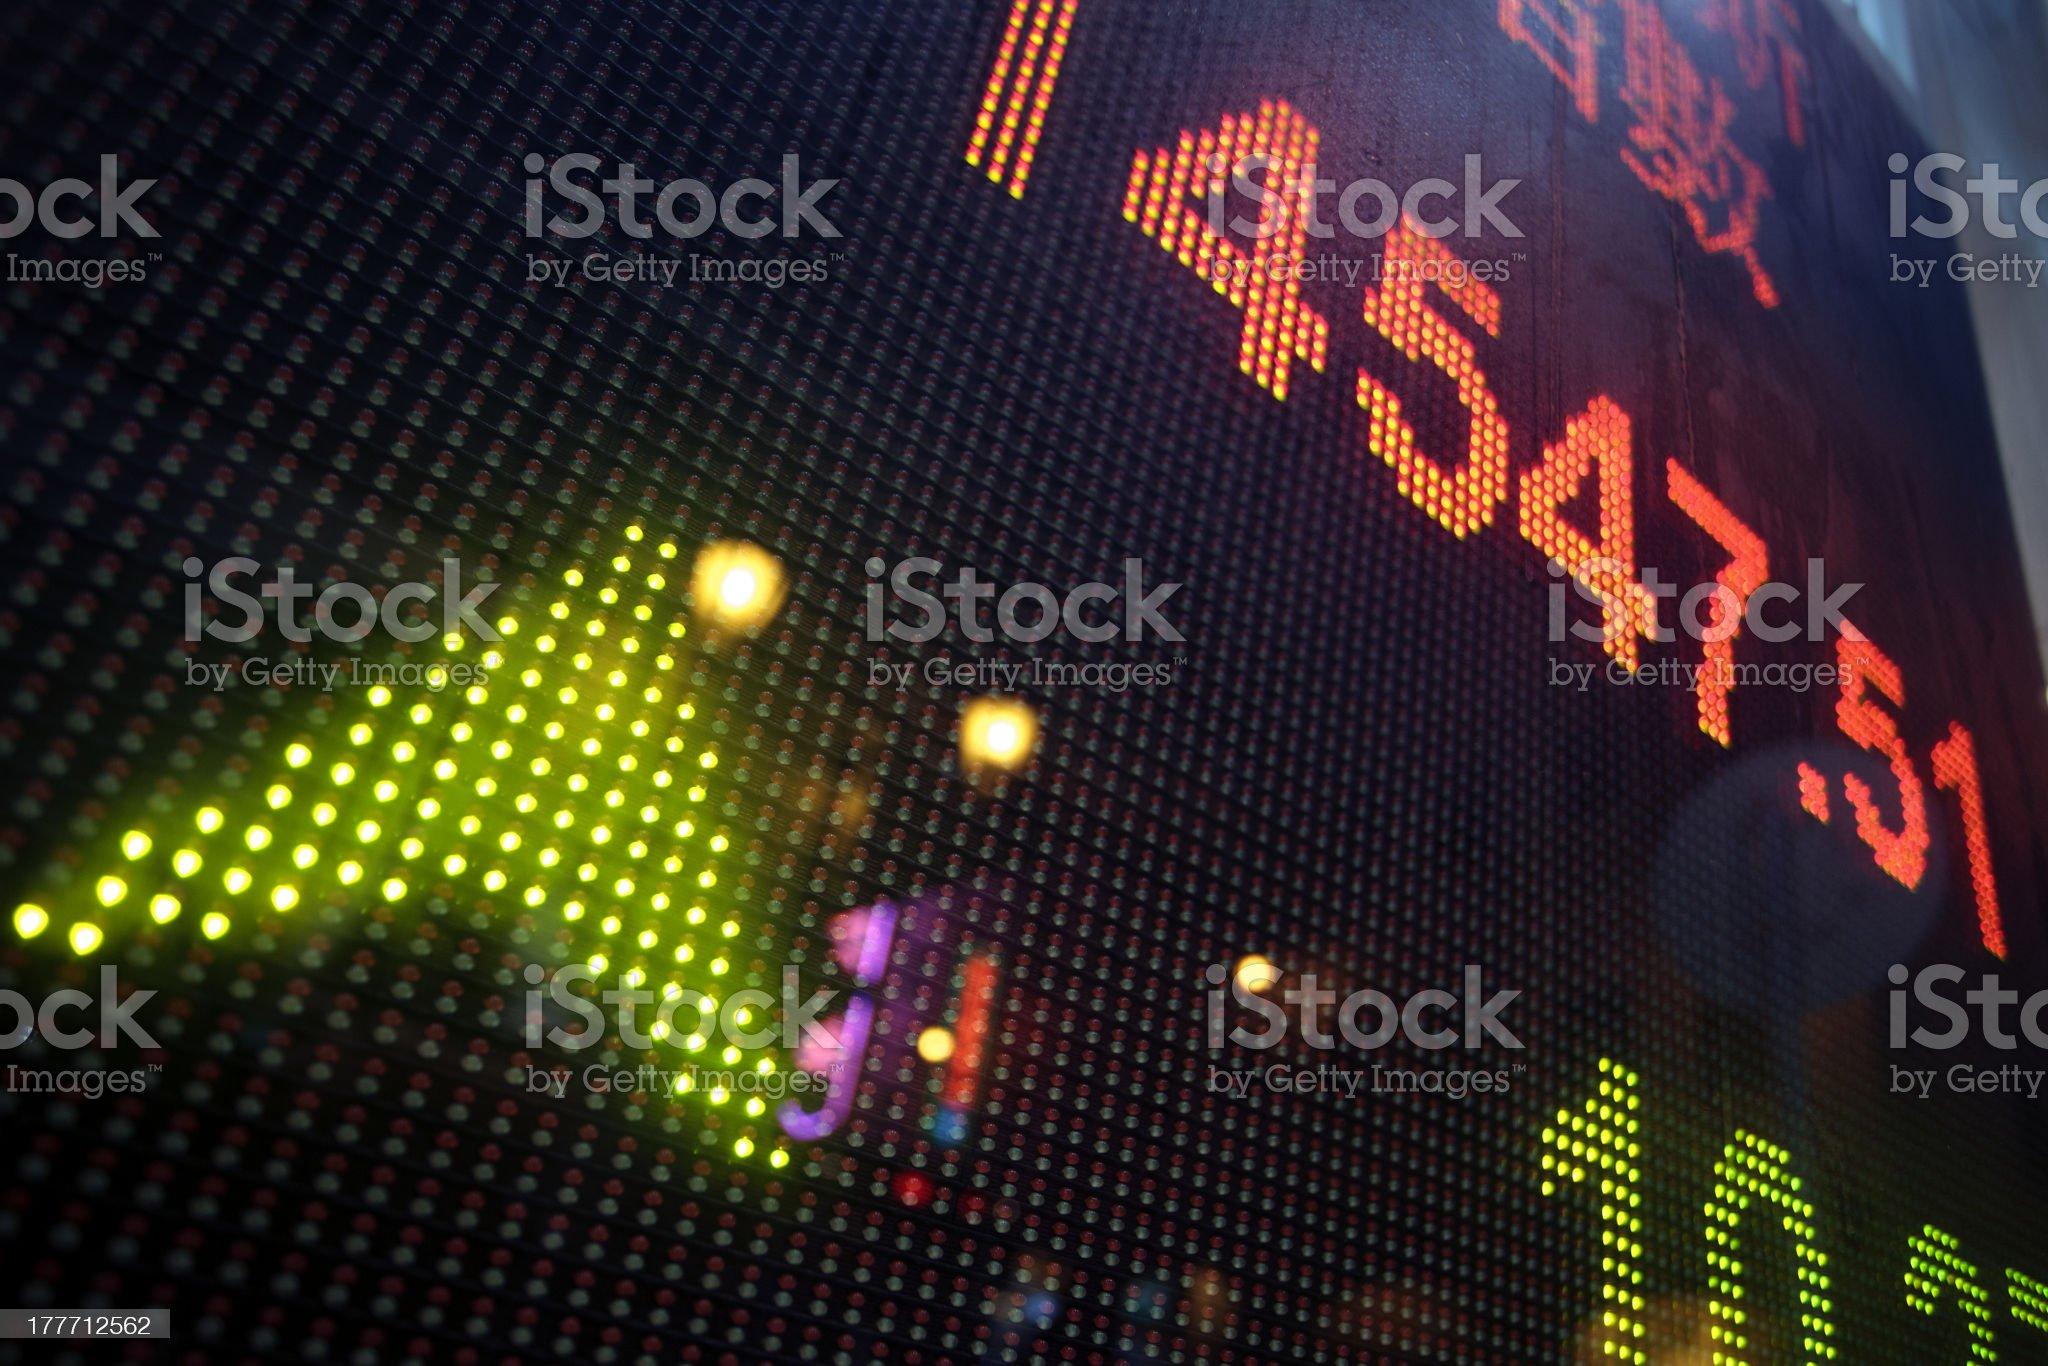 Stock display royalty-free stock photo